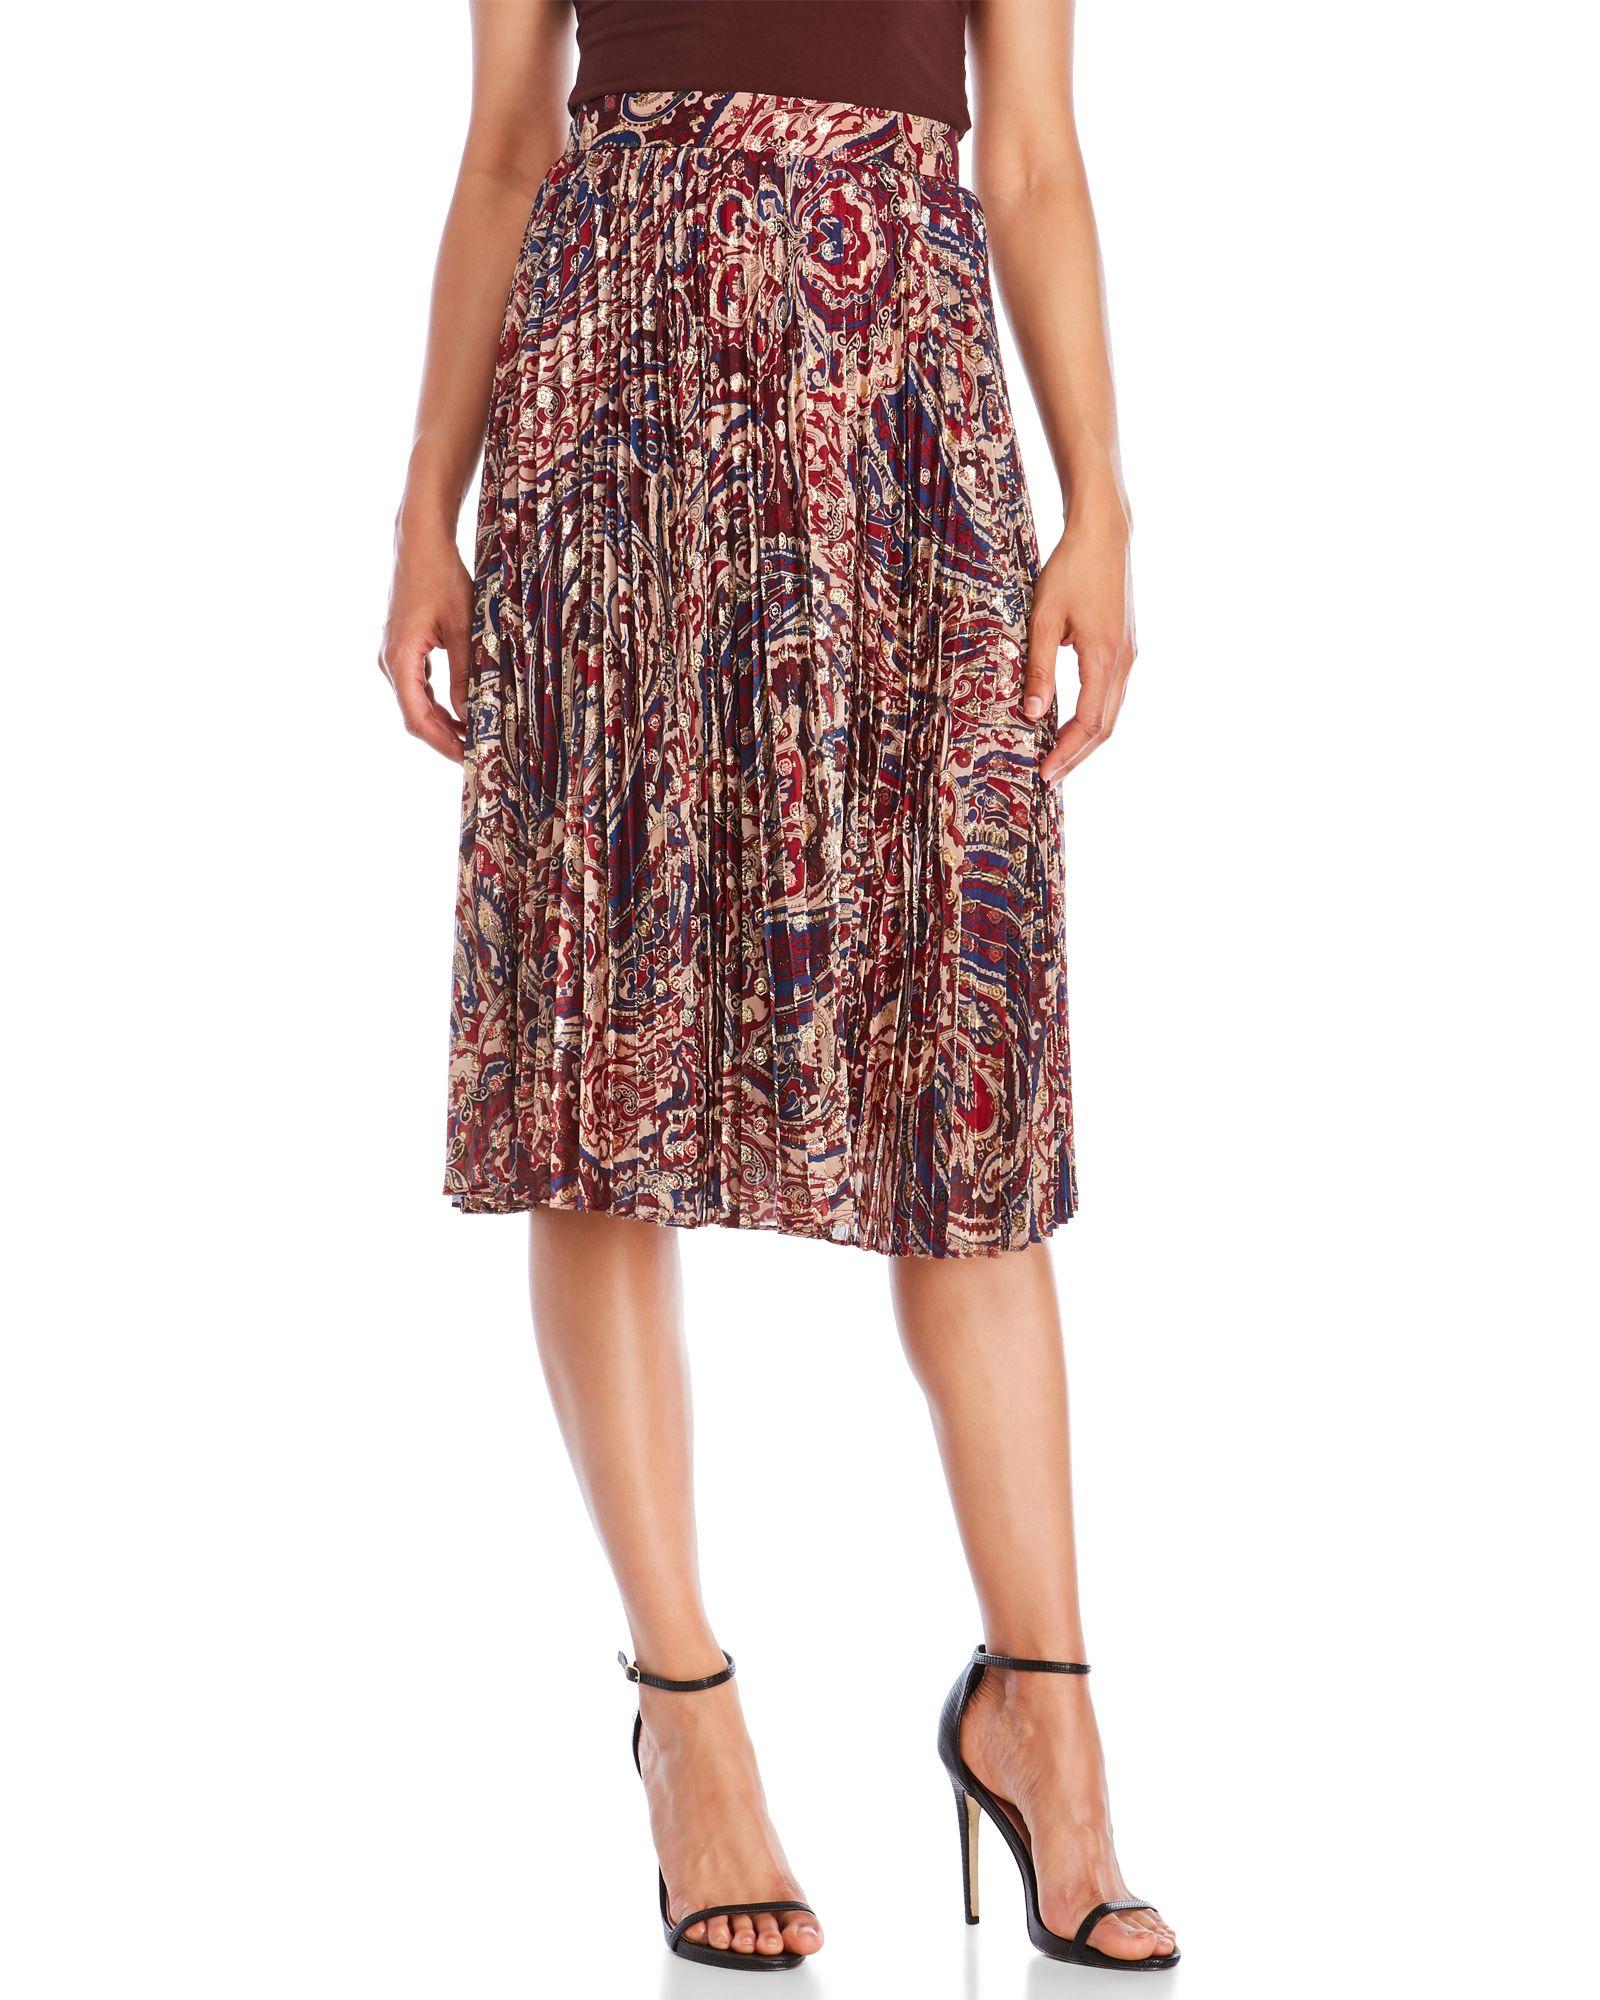 8e5346923ed8e2 Pleated Paisley Midi Skirt | *Apparel & Accessories* | Midi skirt ...